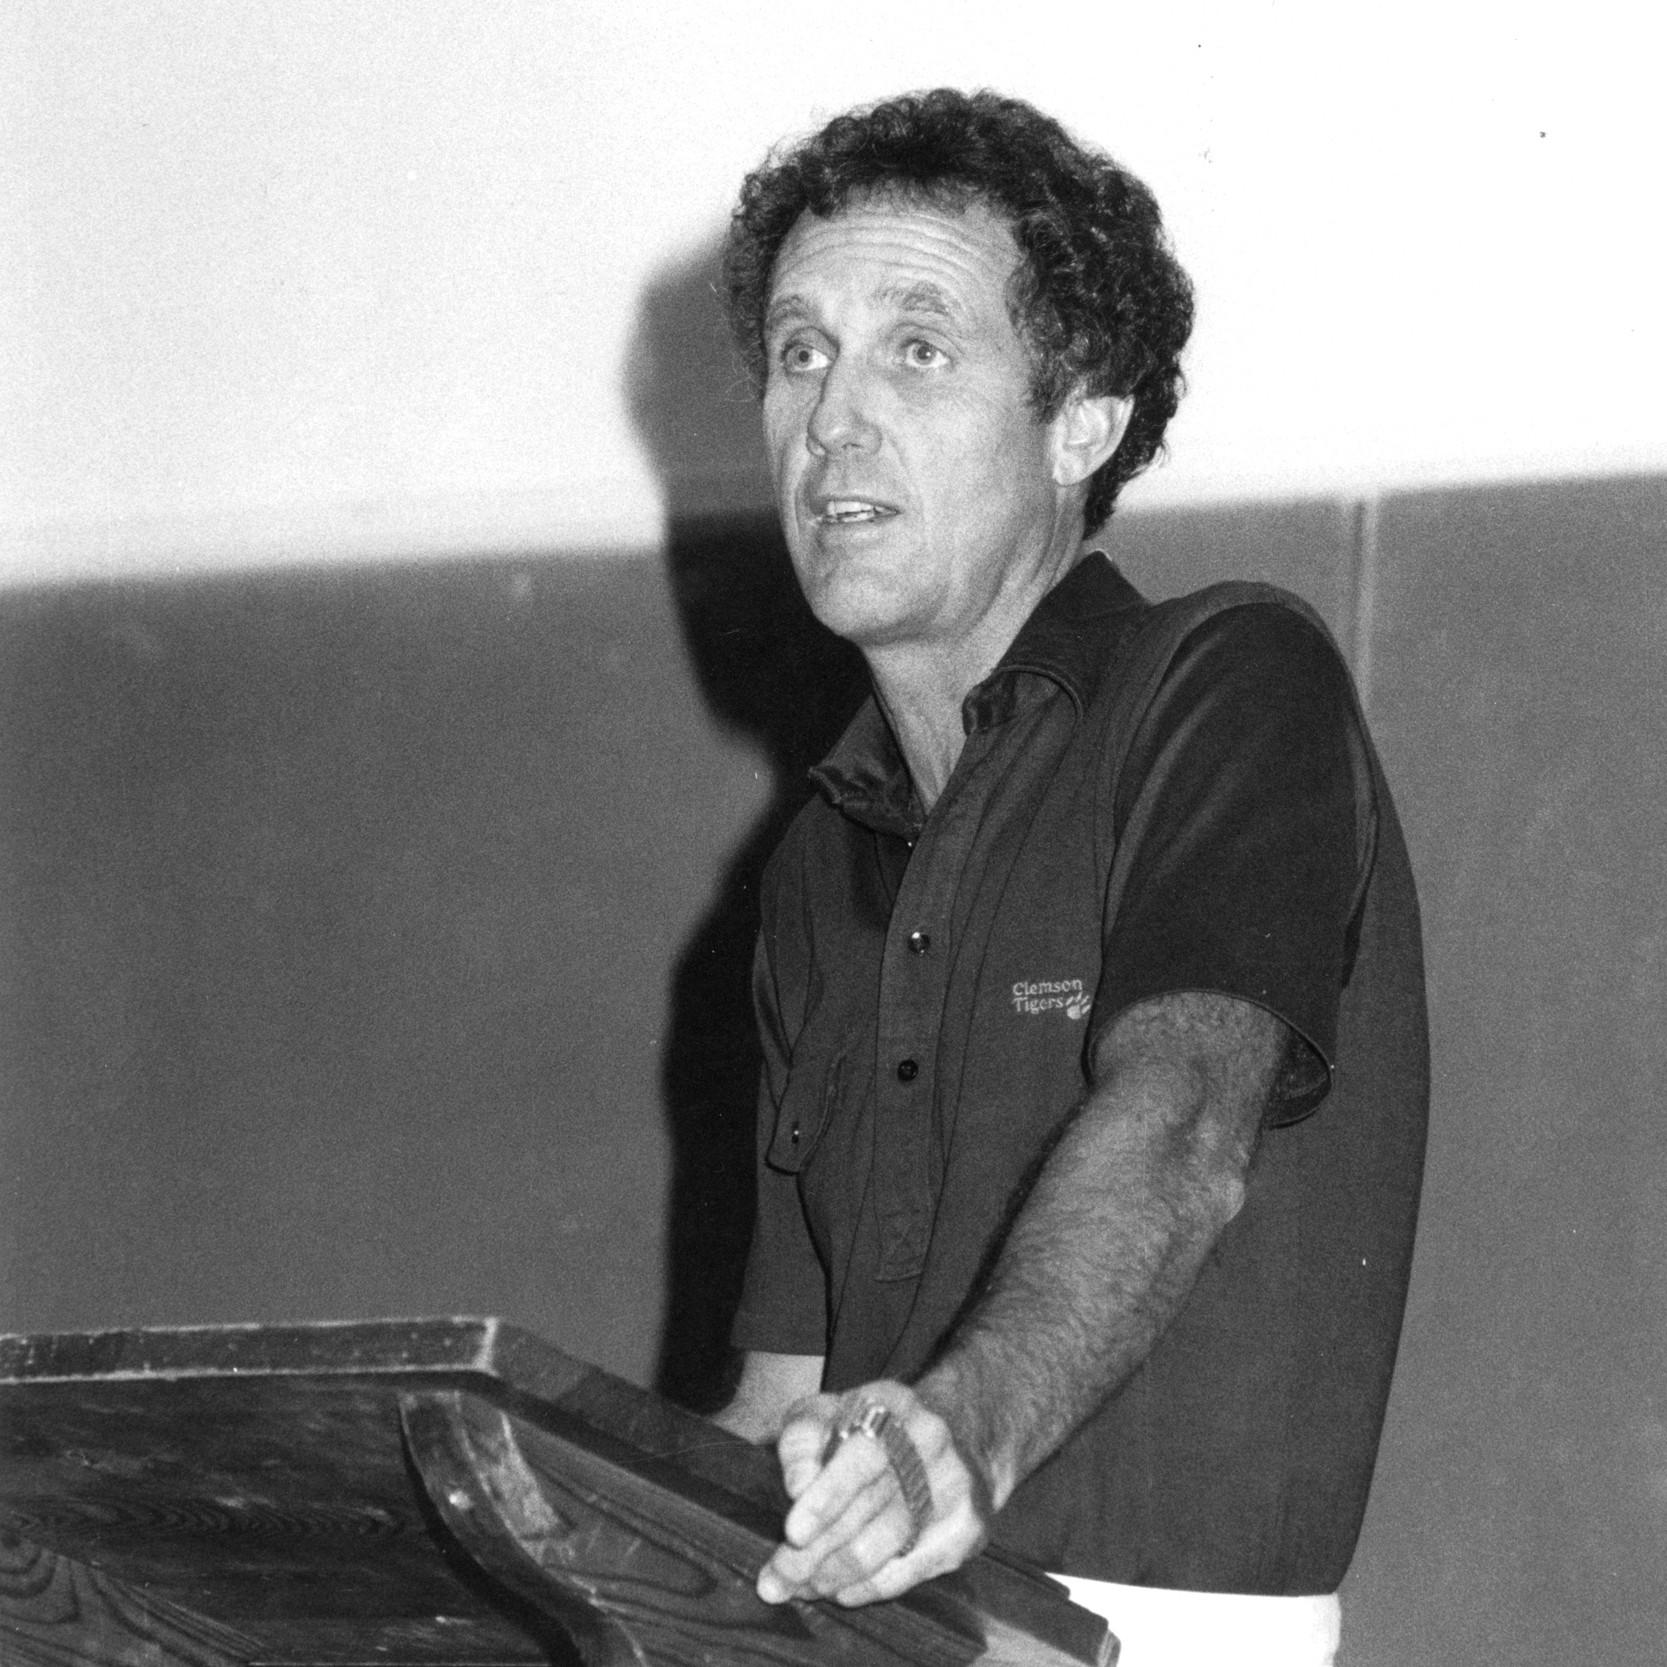 Bill Foster, More Than A Coach